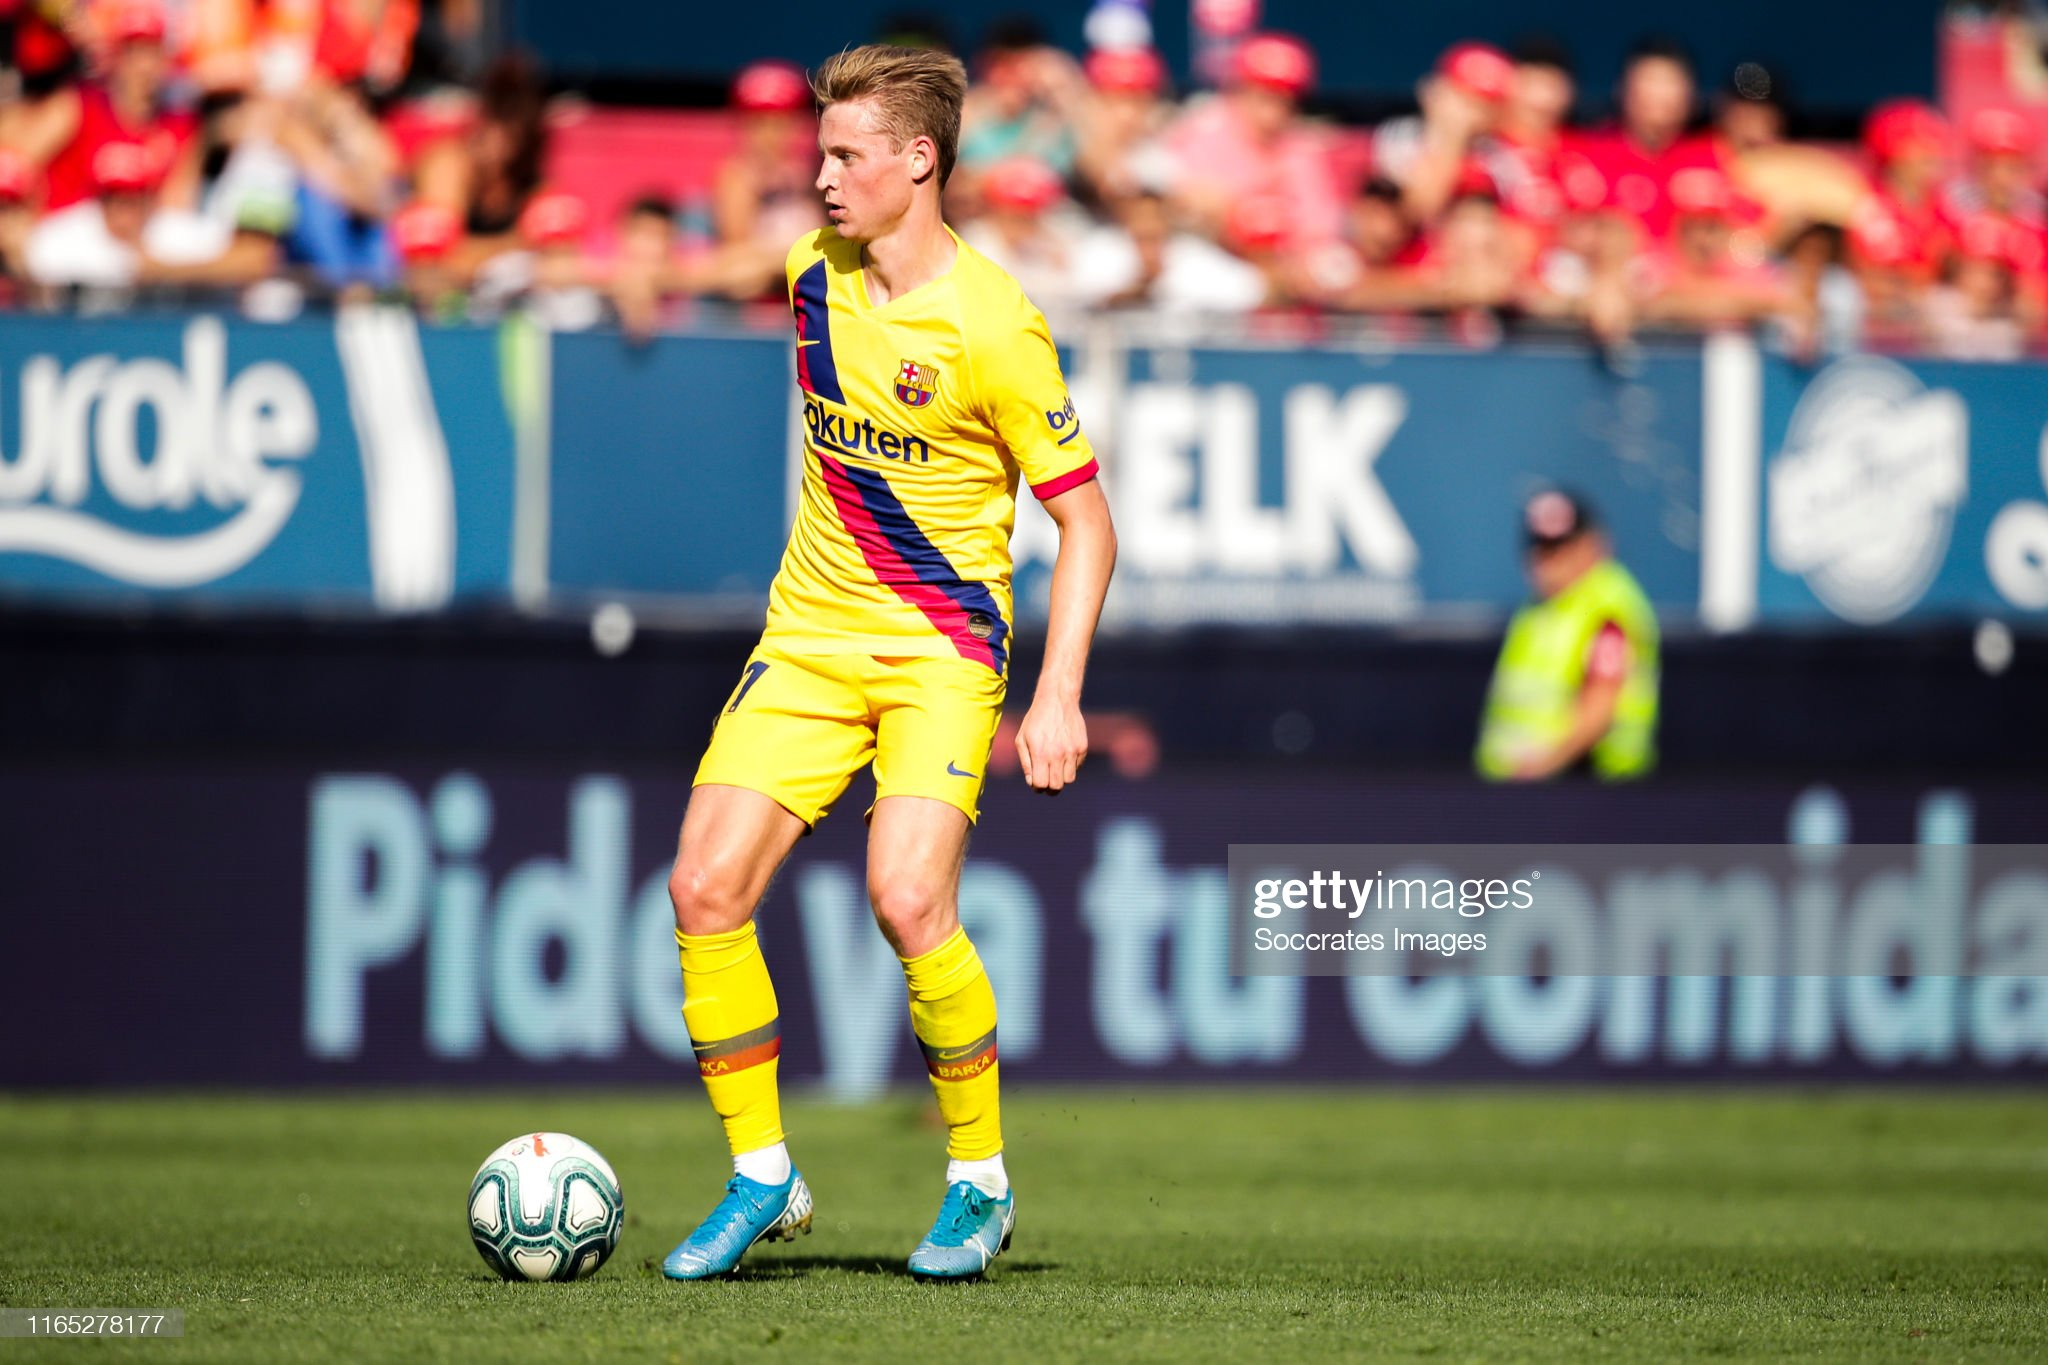 صور مباراة : أوساسونا - برشلونة 2-2 ( 31-08-2019 )  Frenkie-de-jong-of-fc-barcelona-during-the-la-liga-santander-match-picture-id1165278177?s=2048x2048